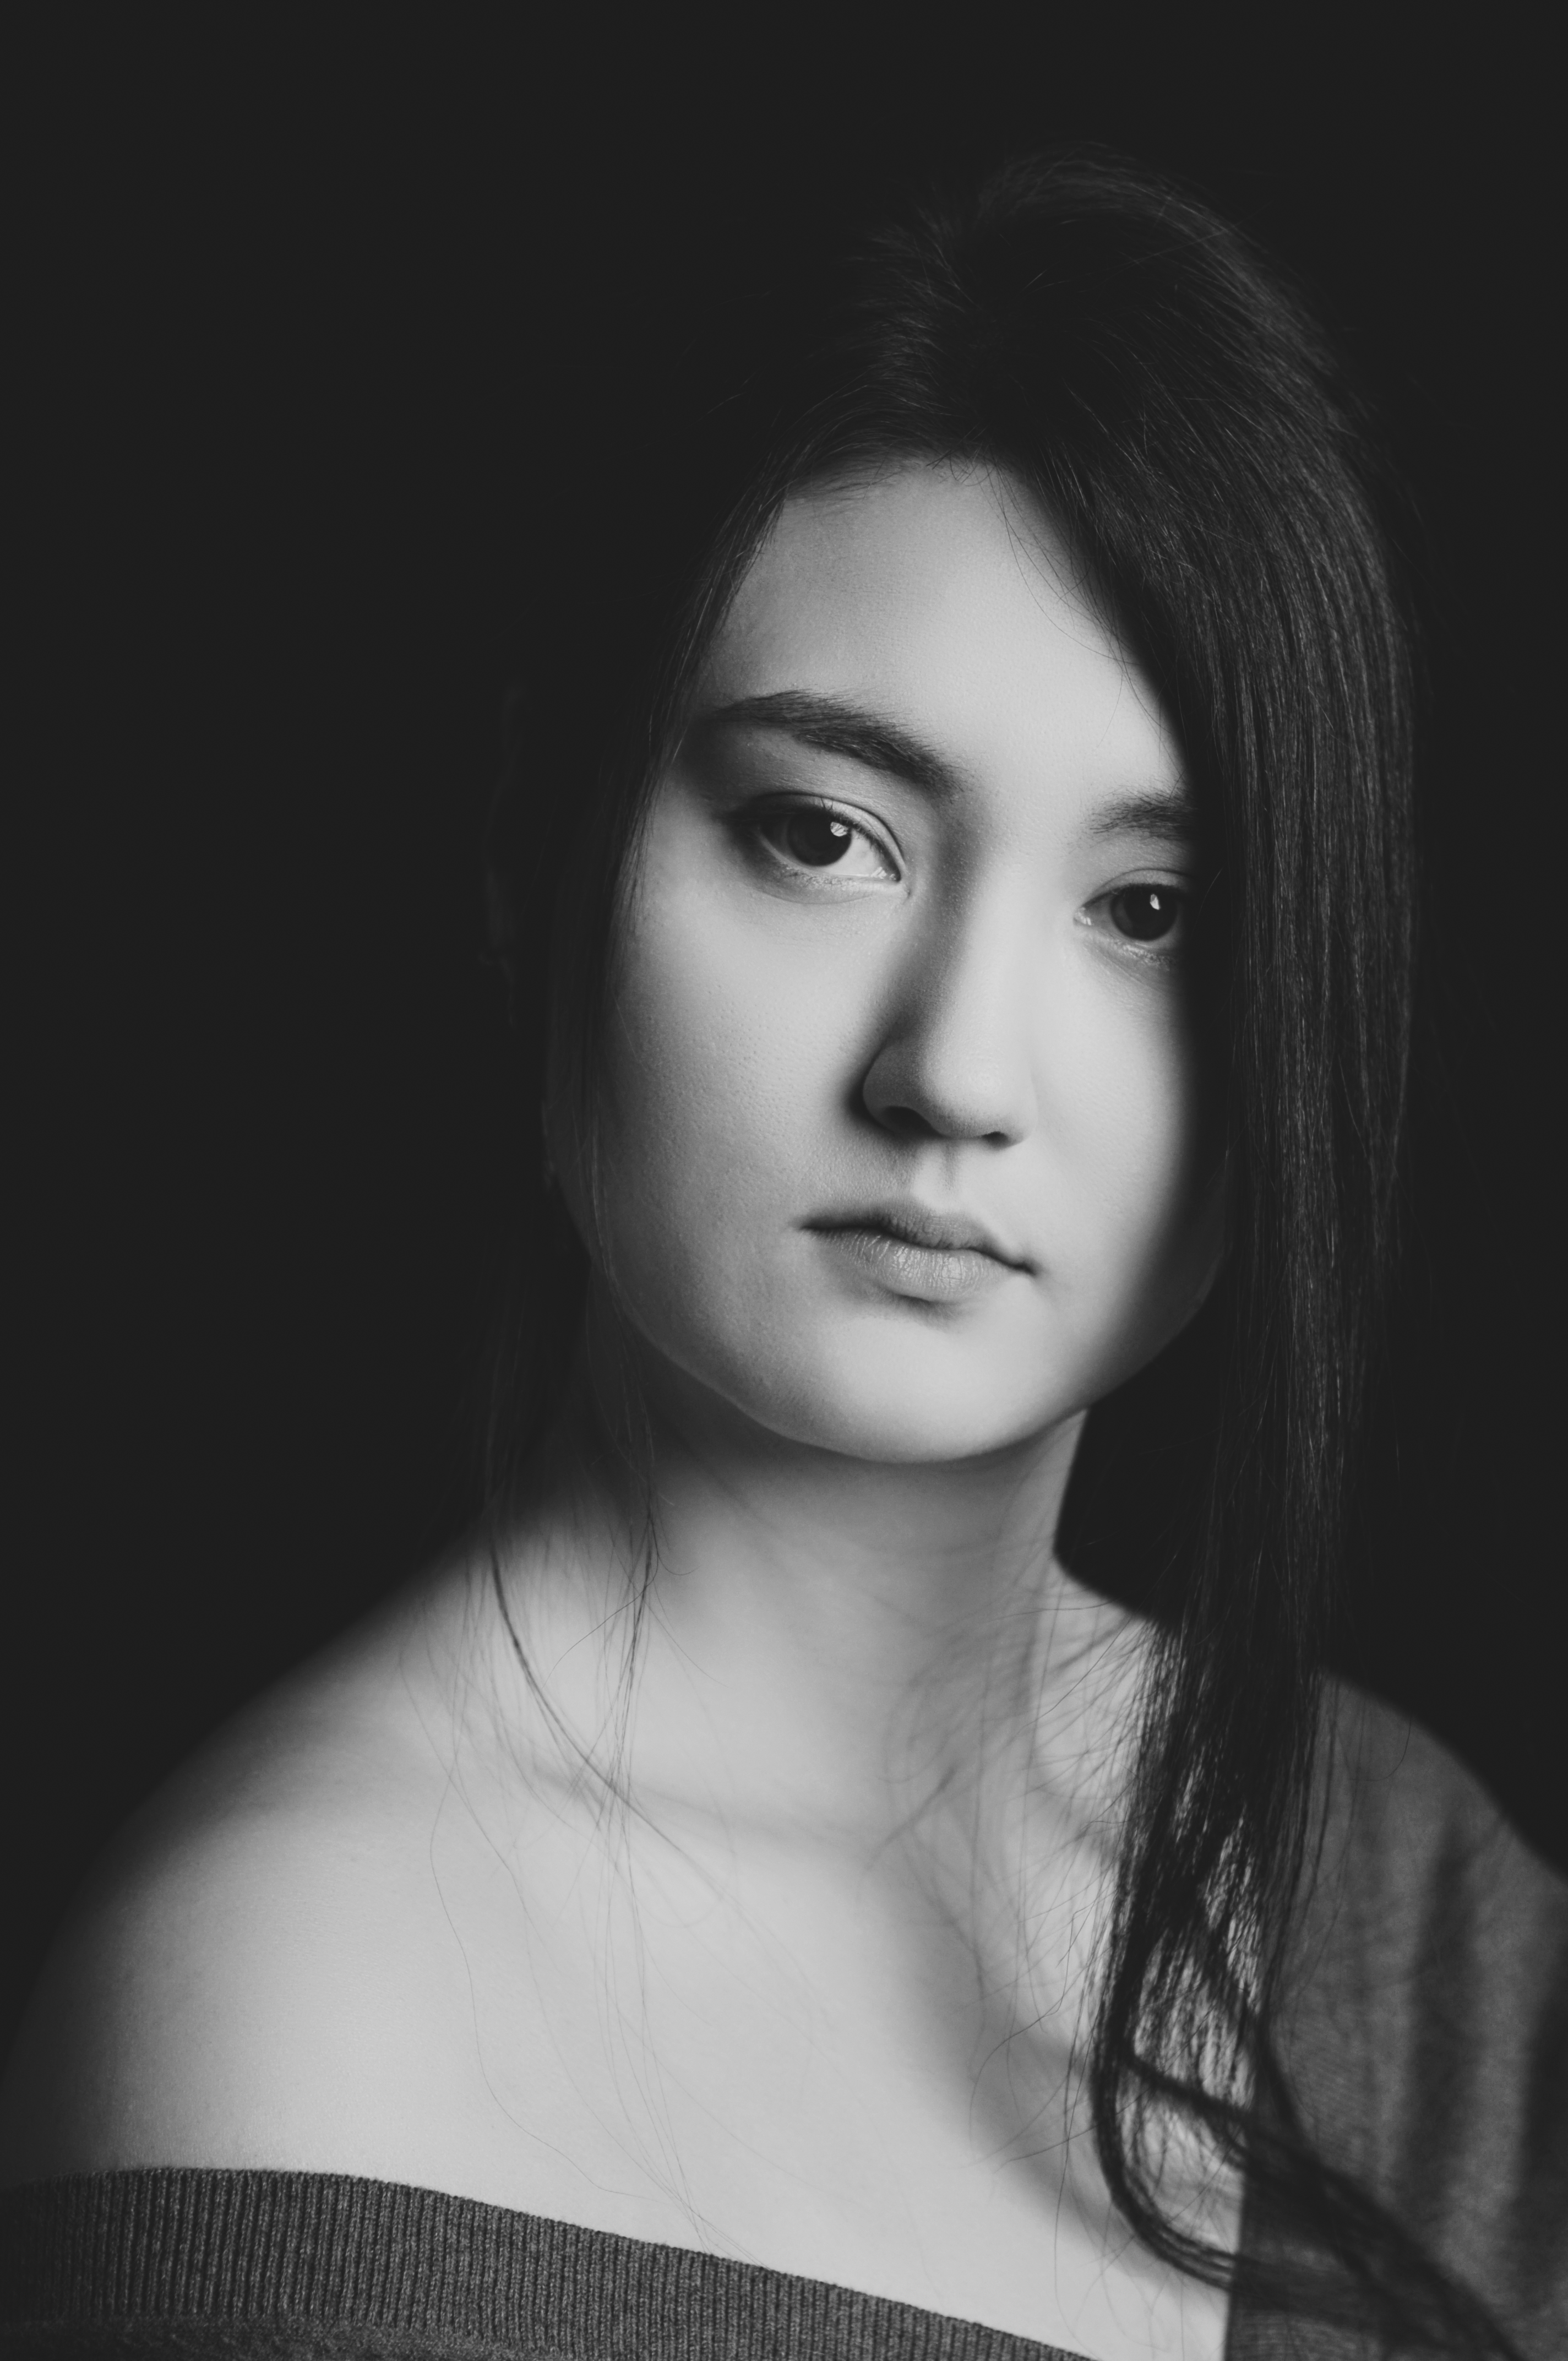 portret_5